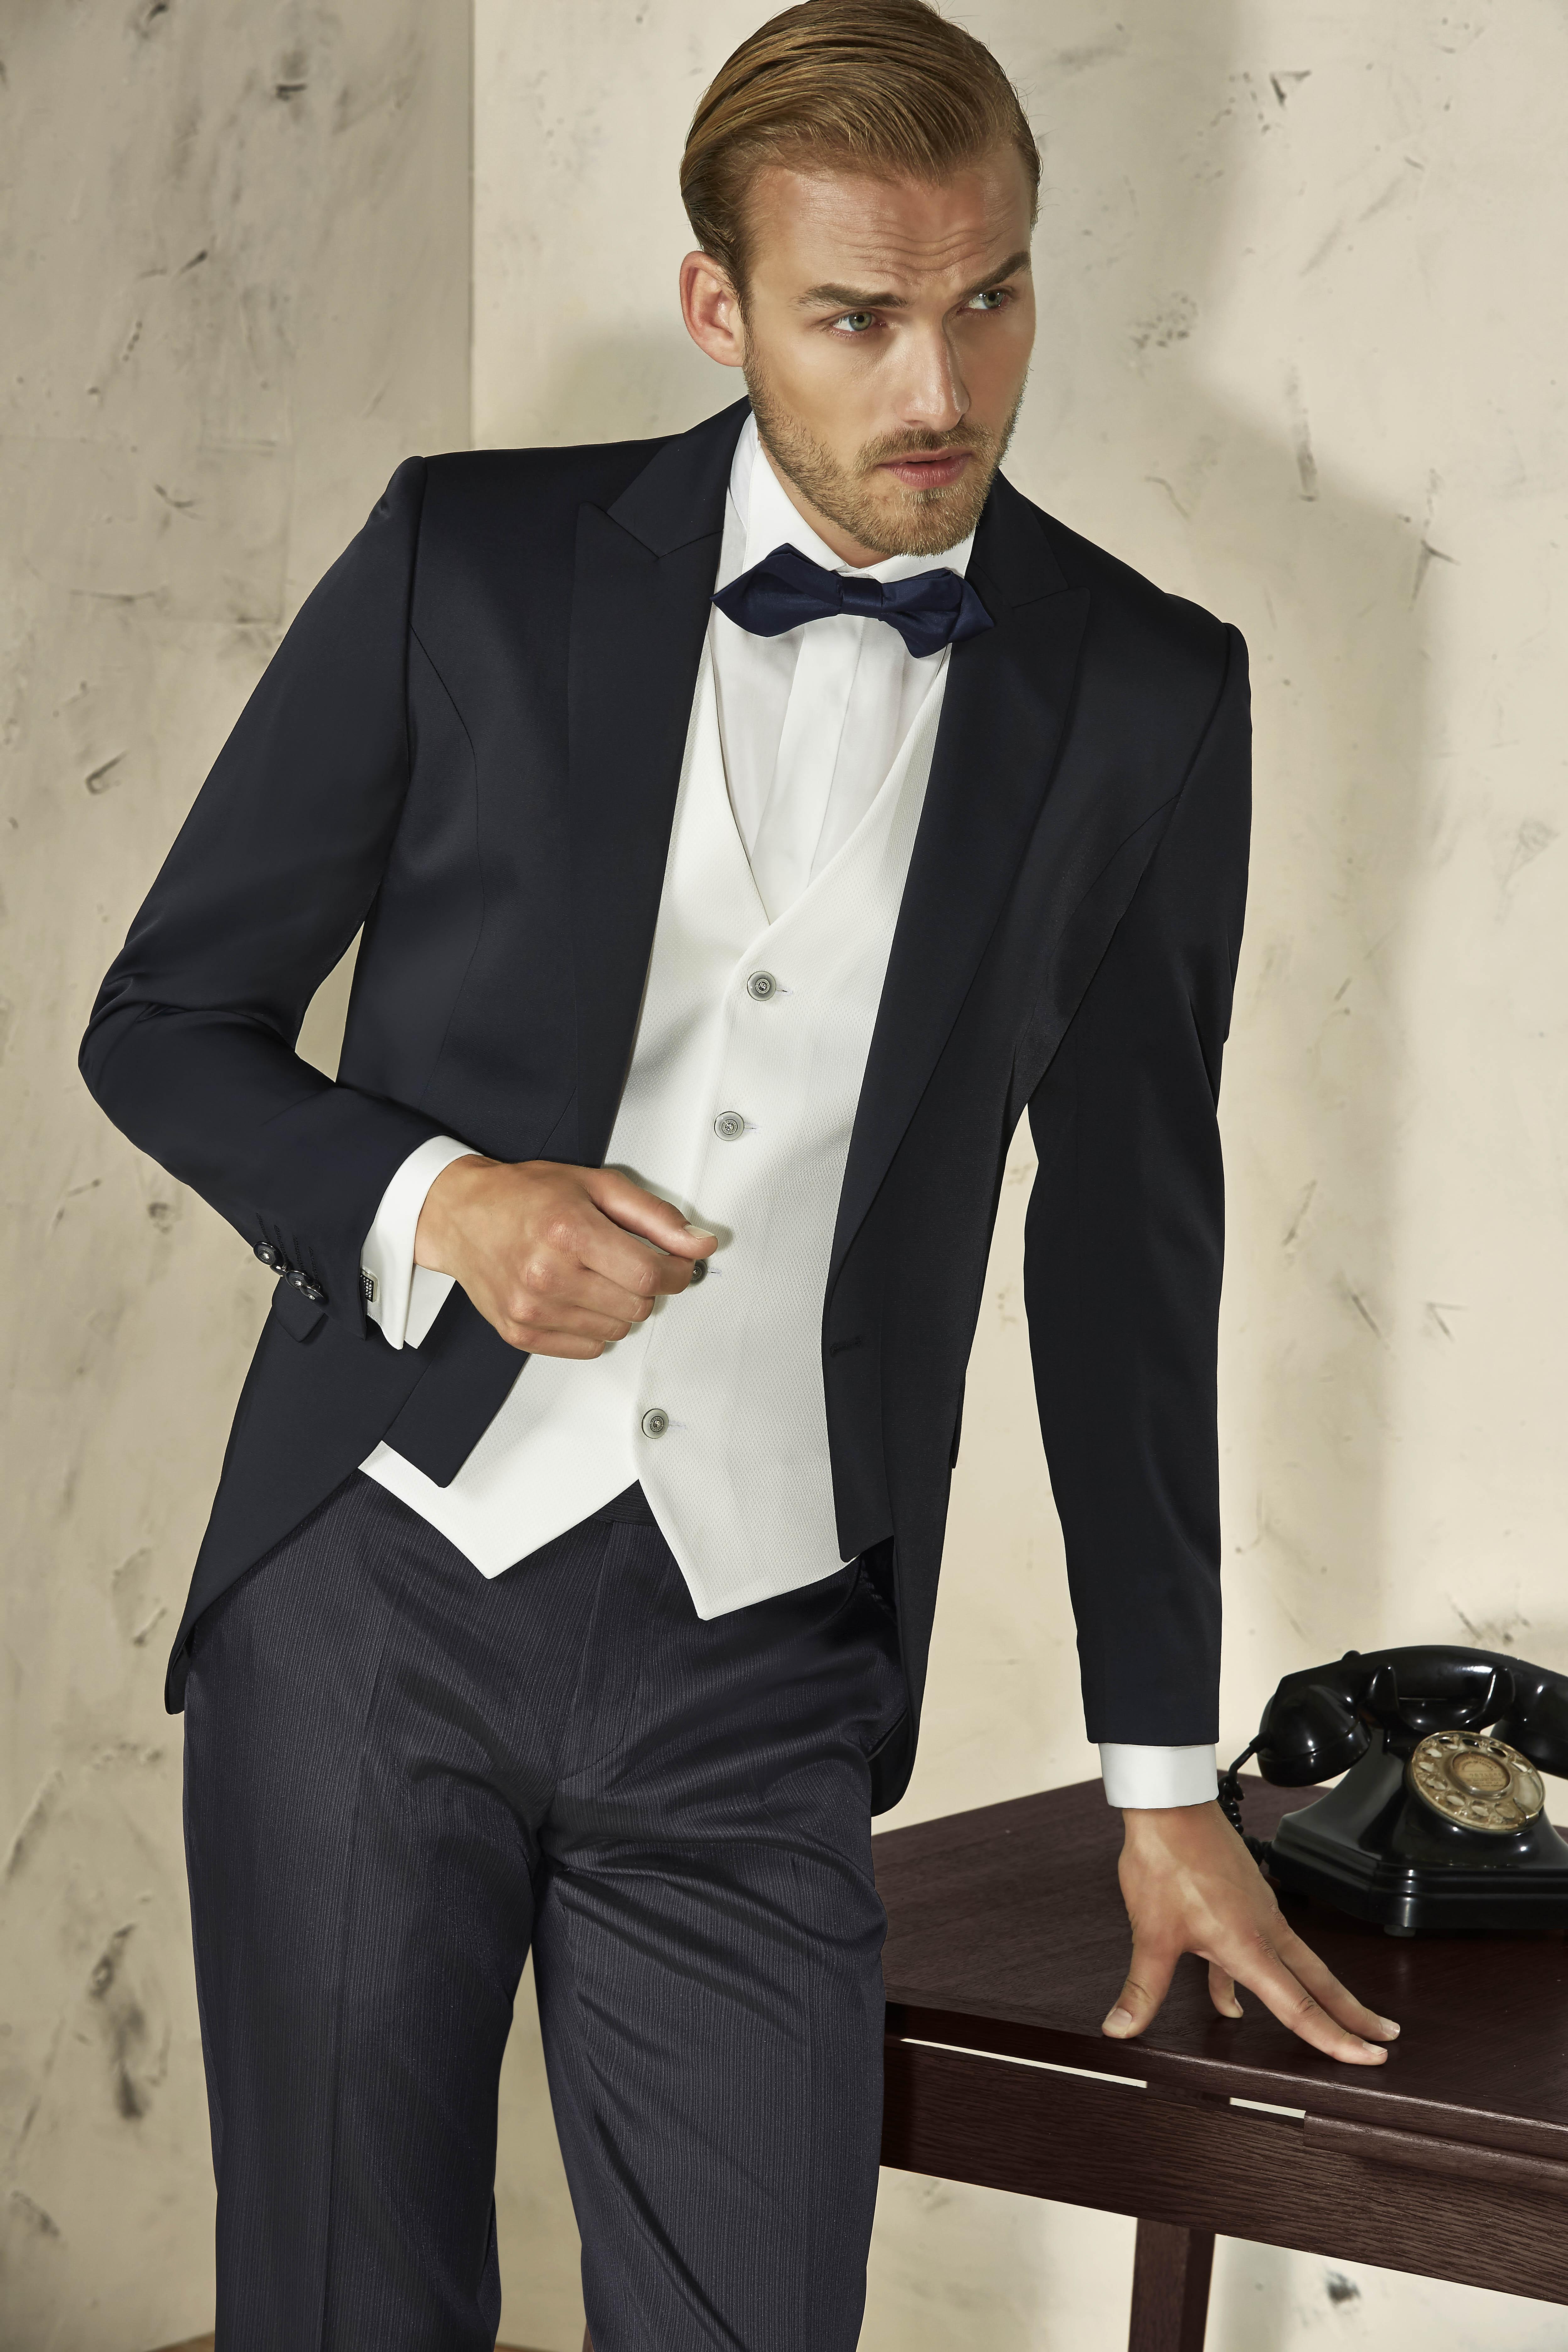 mod-19 blanco con negro en seda